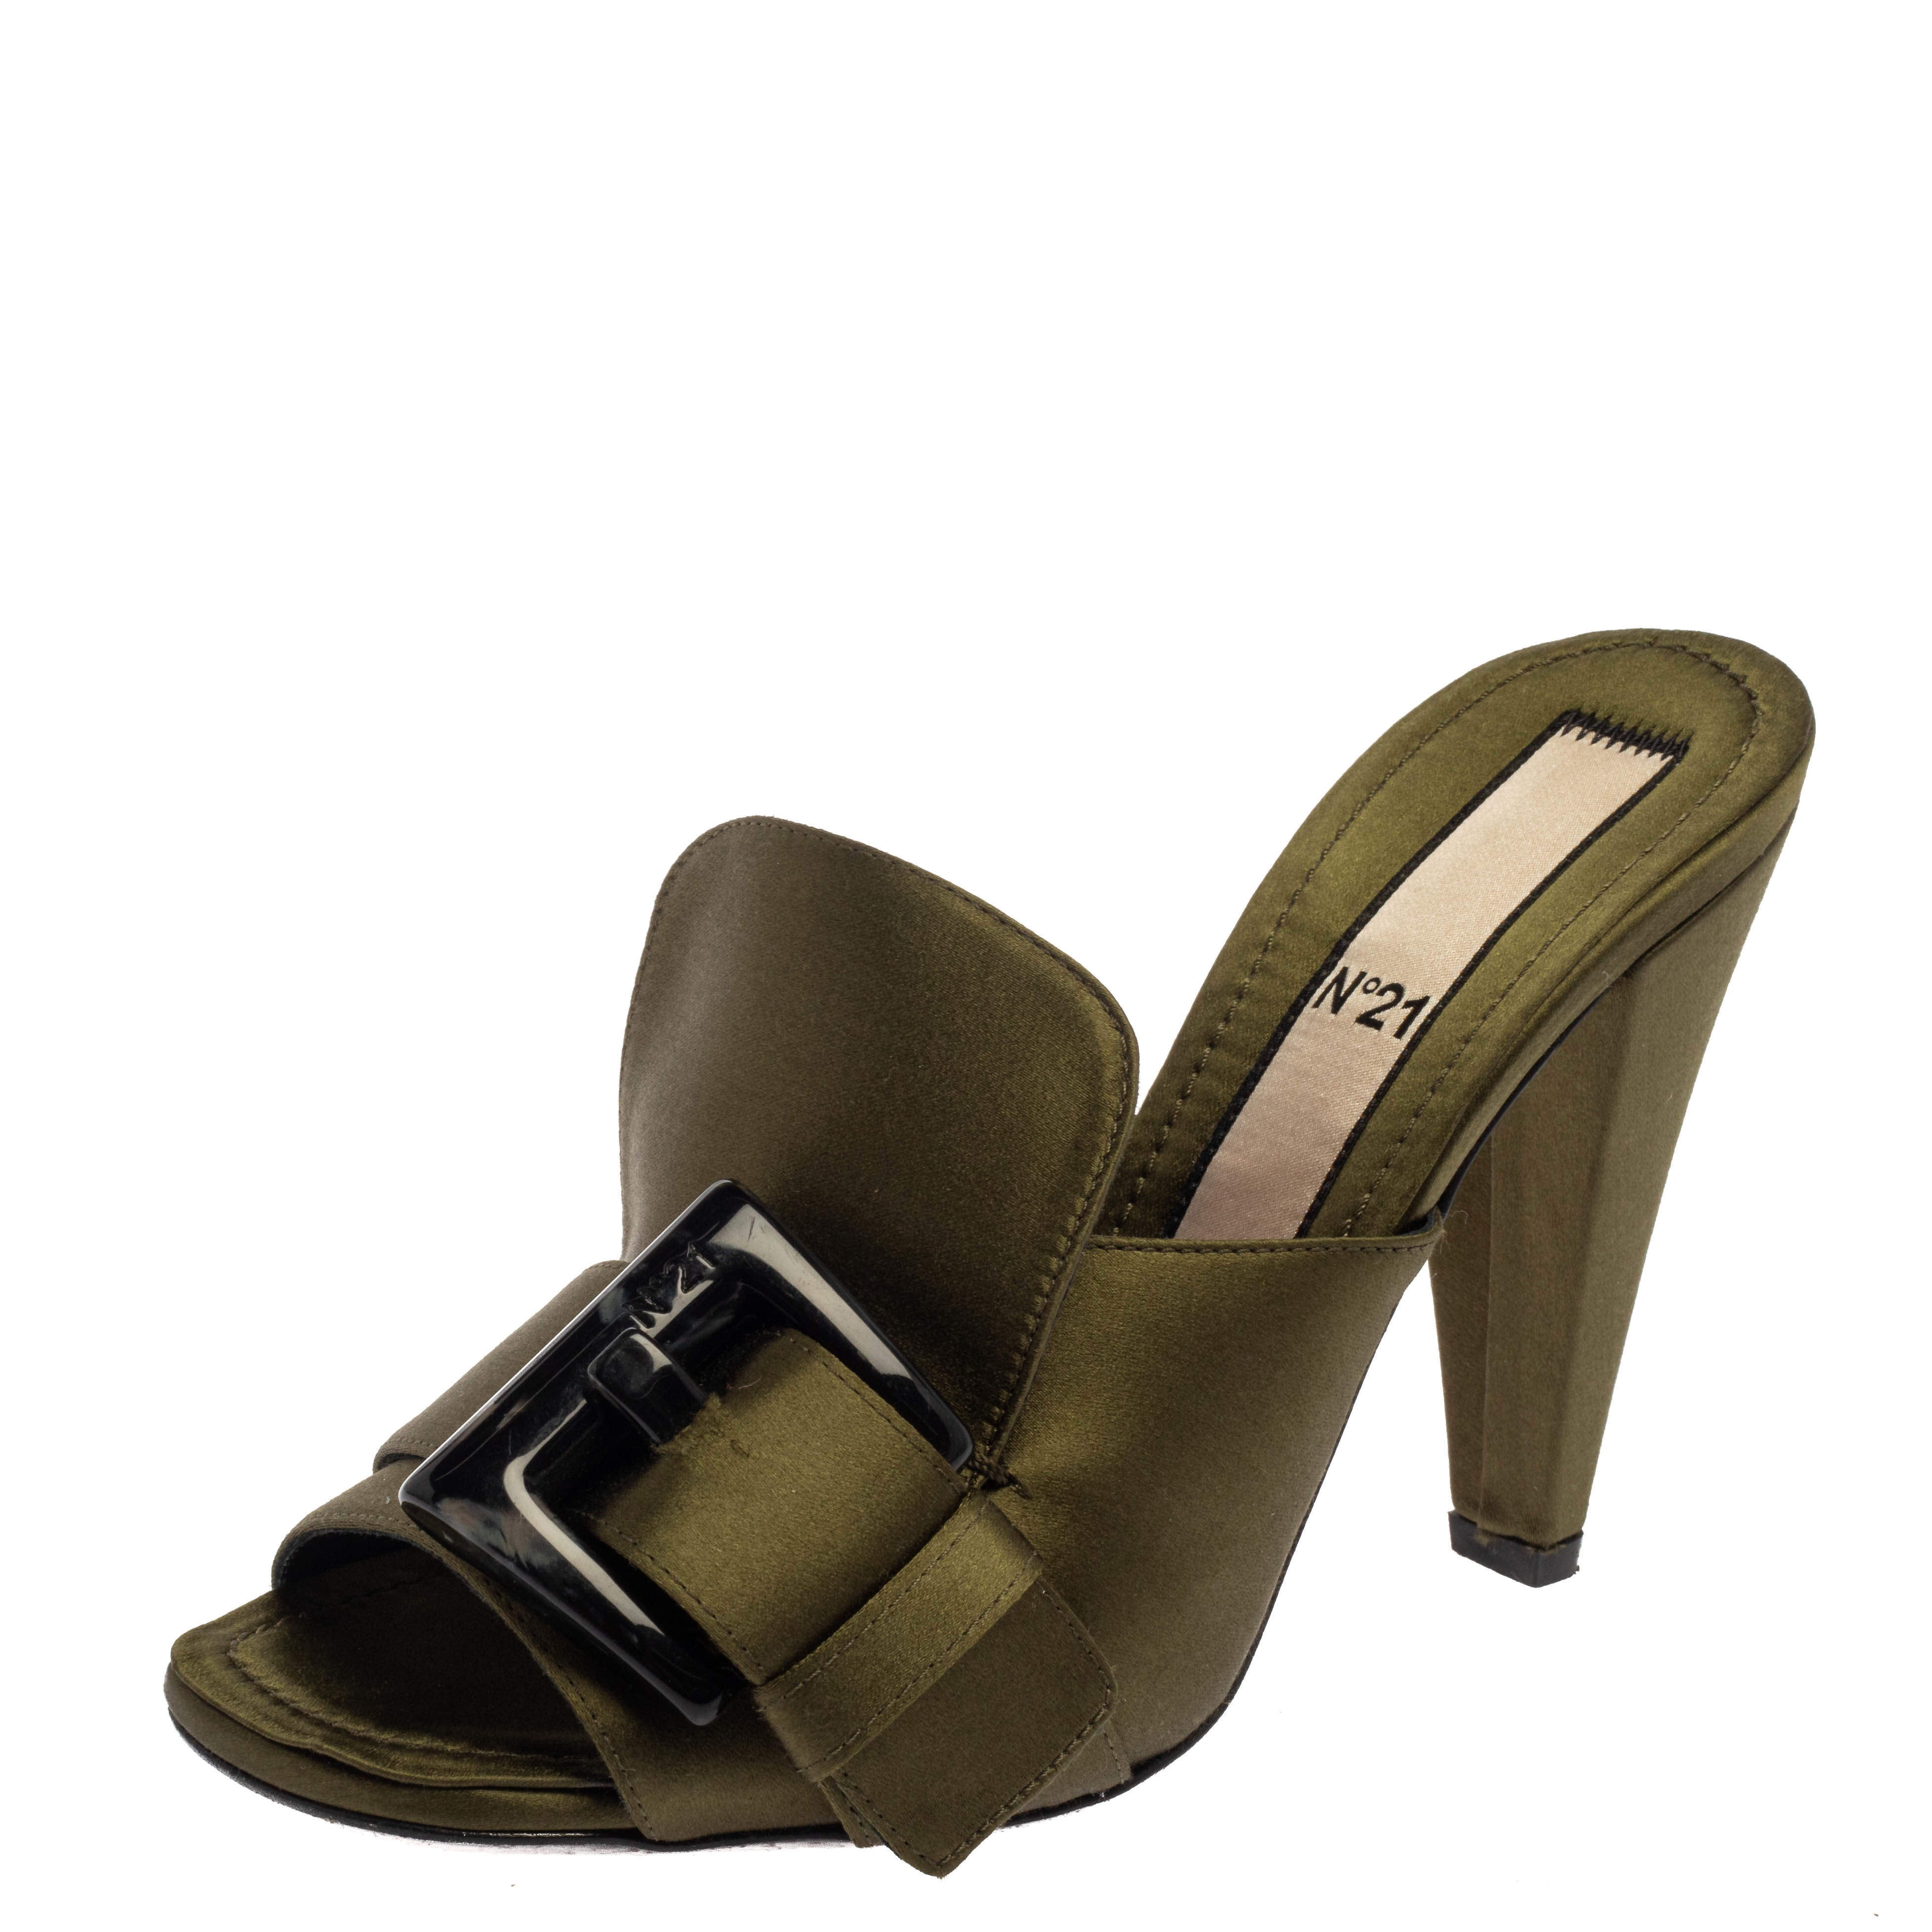 N21 Green Satin  Slip On Mule Sandals Size 37.5